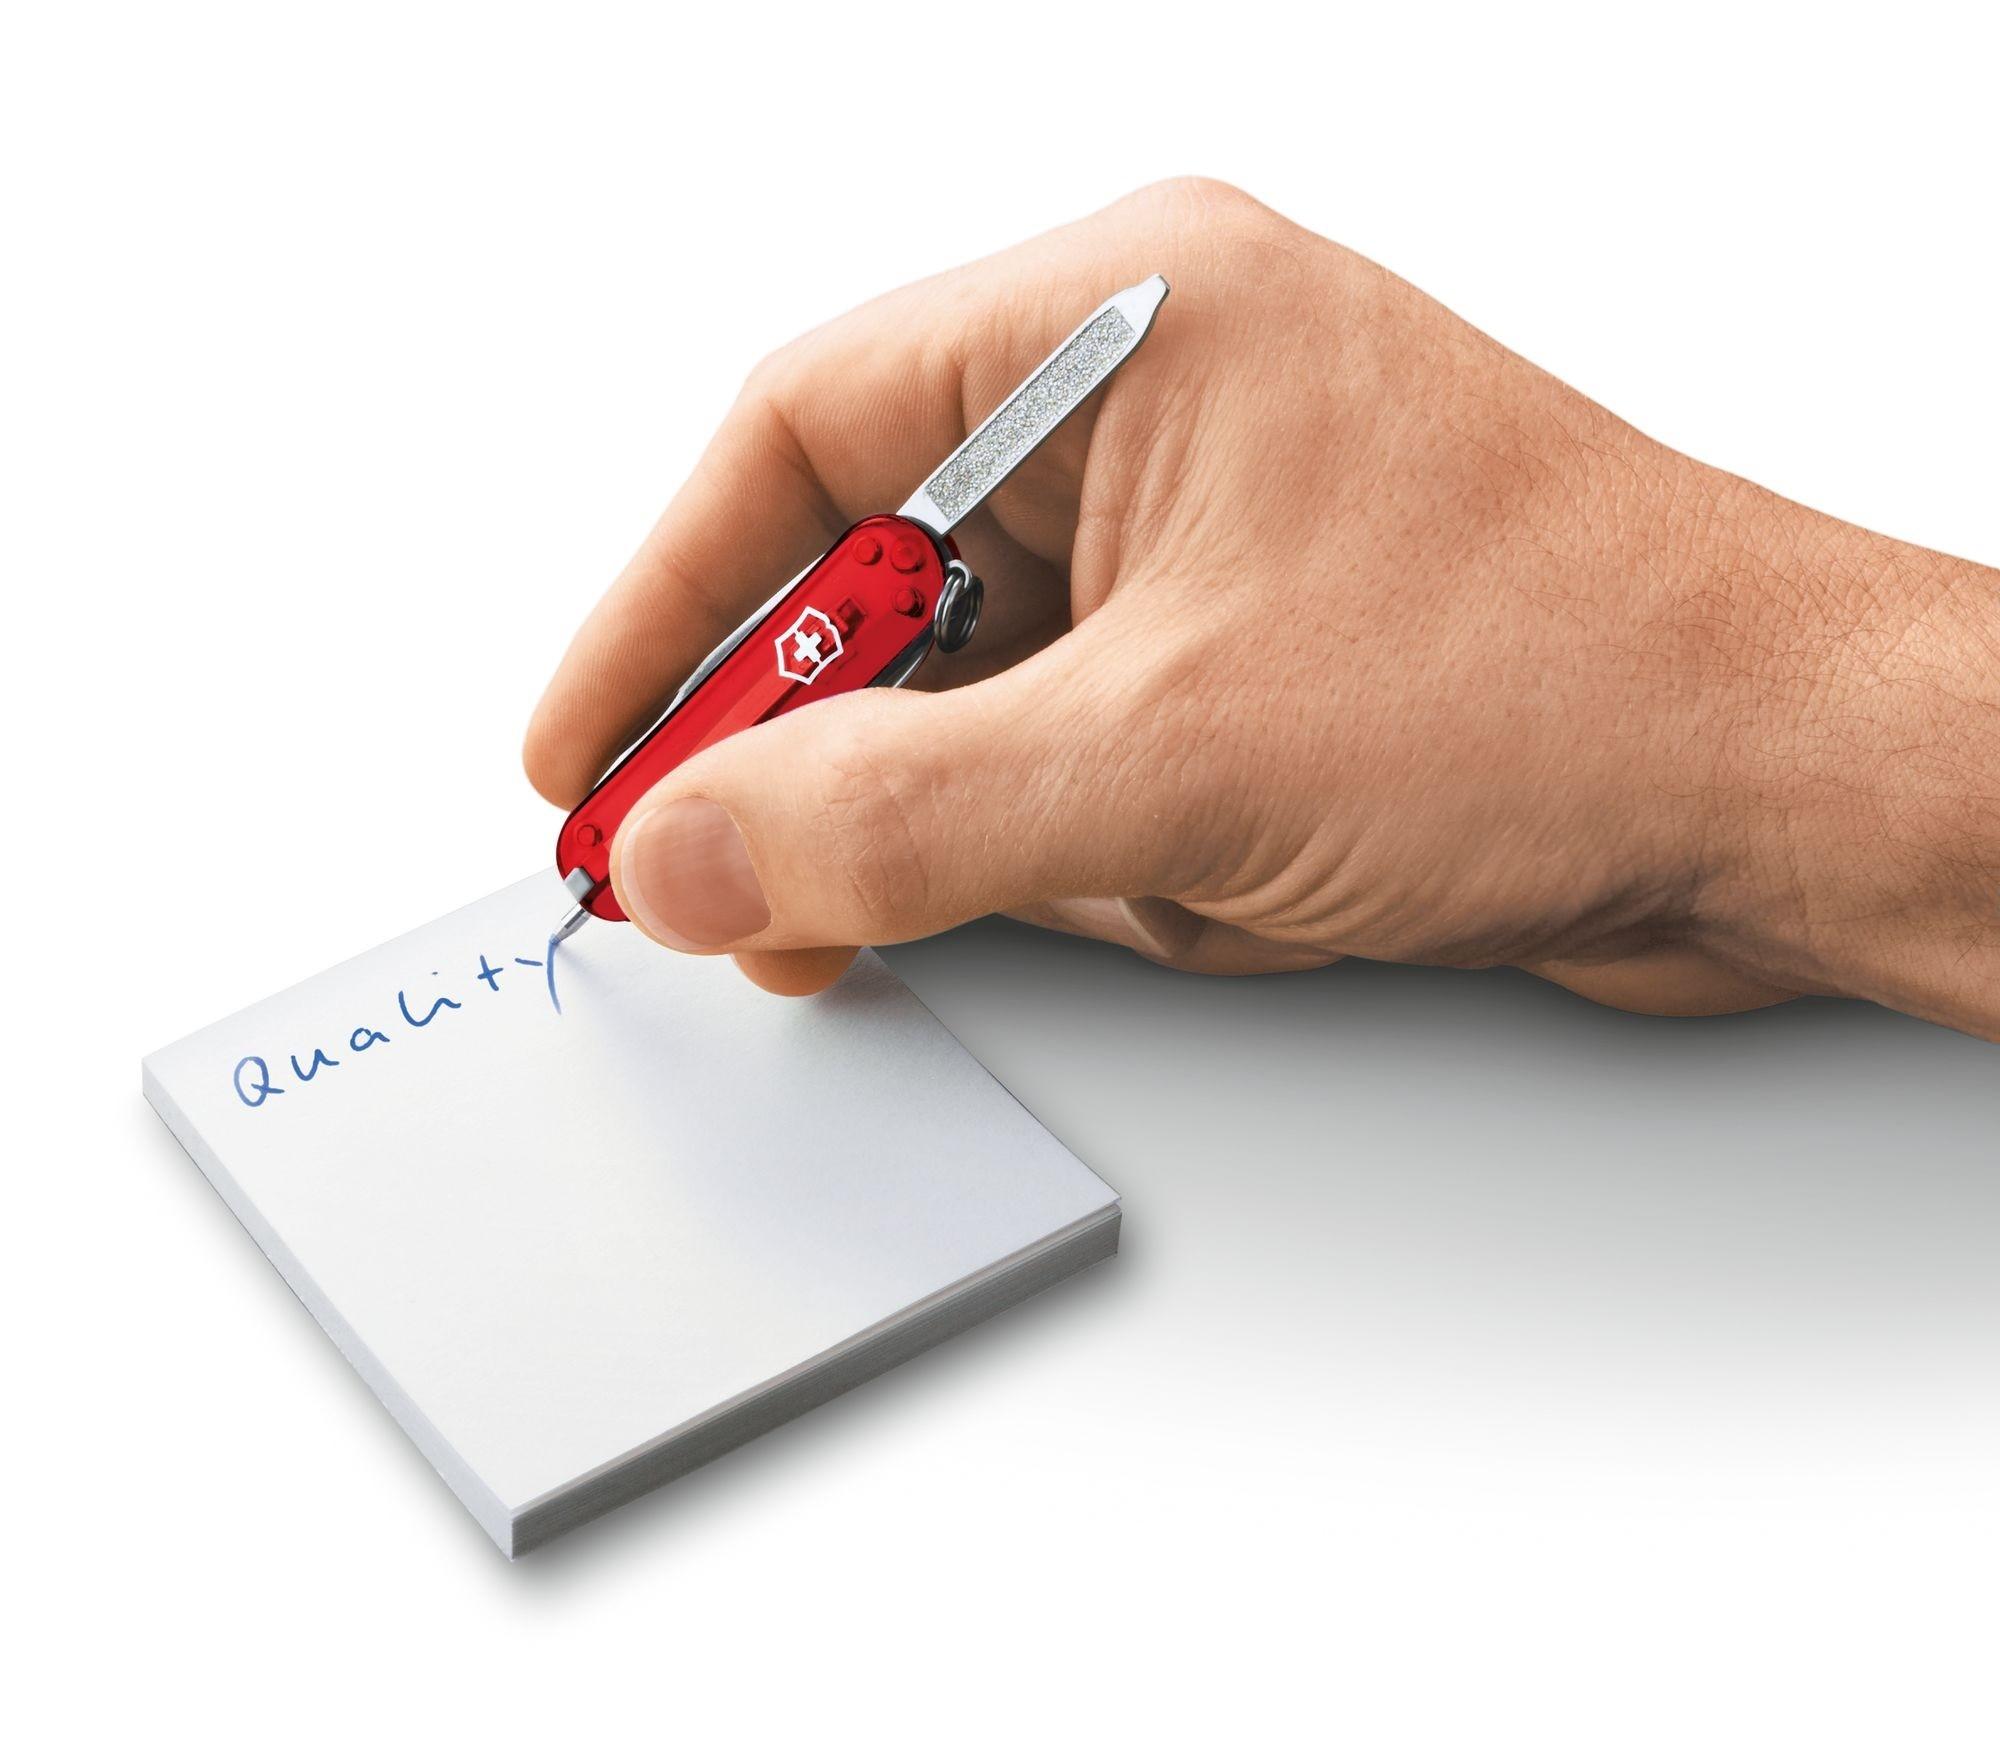 Mini Canivete Suíço Signature Victorinox com caneta 8 funções 0.6225.T  - Mix Eletro